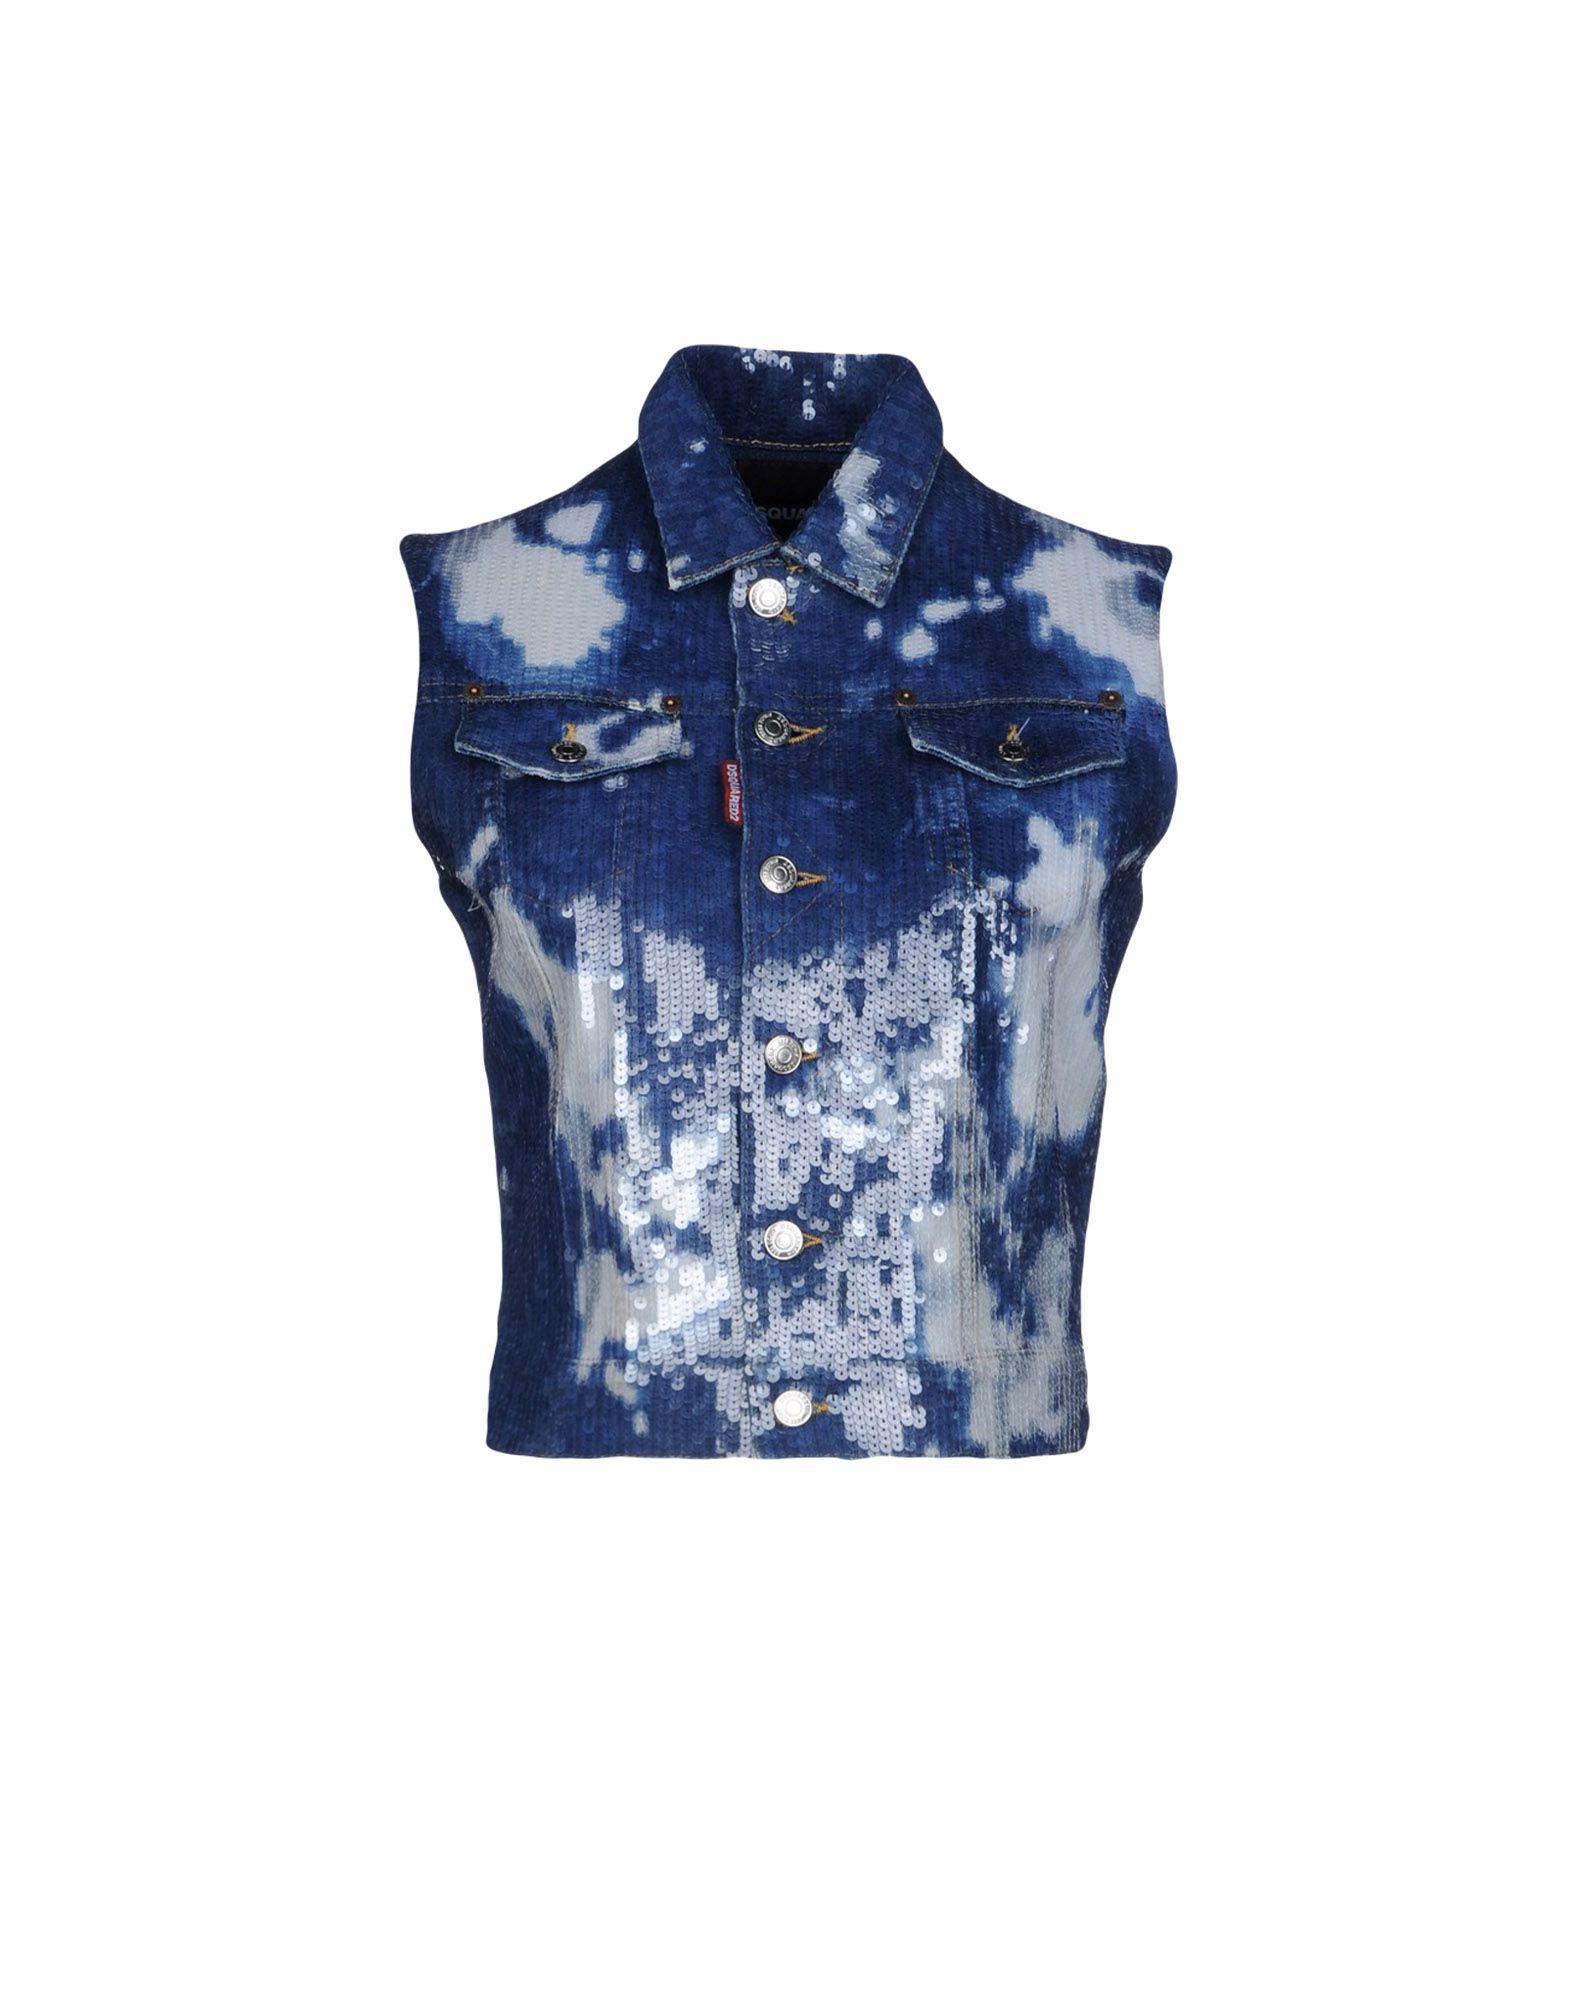 Giubbotto Jeans Dsquared2 Donna - Acquista online su WaiVjm9u